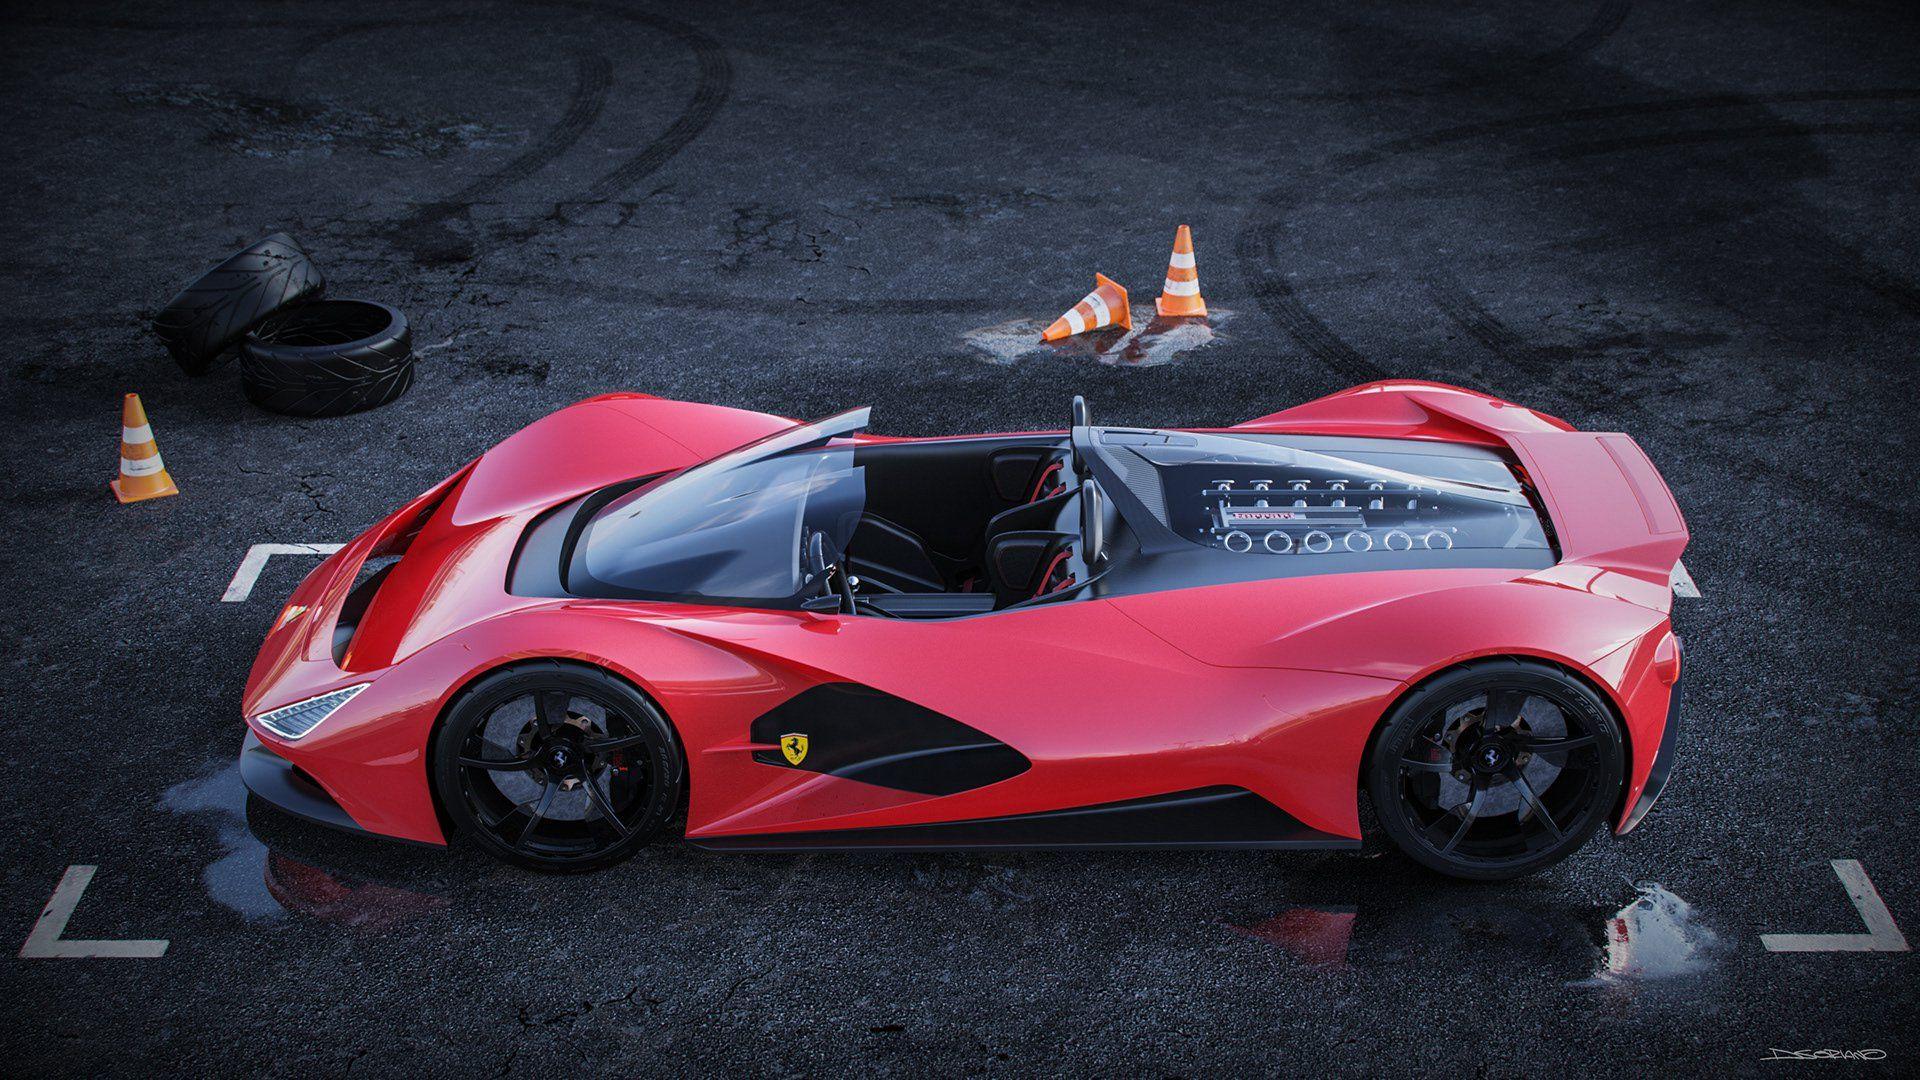 The Ferrari Aliante Is The Ultimate Italian Barchetta Carscoops Super Cars Ferrari Car Ferrari